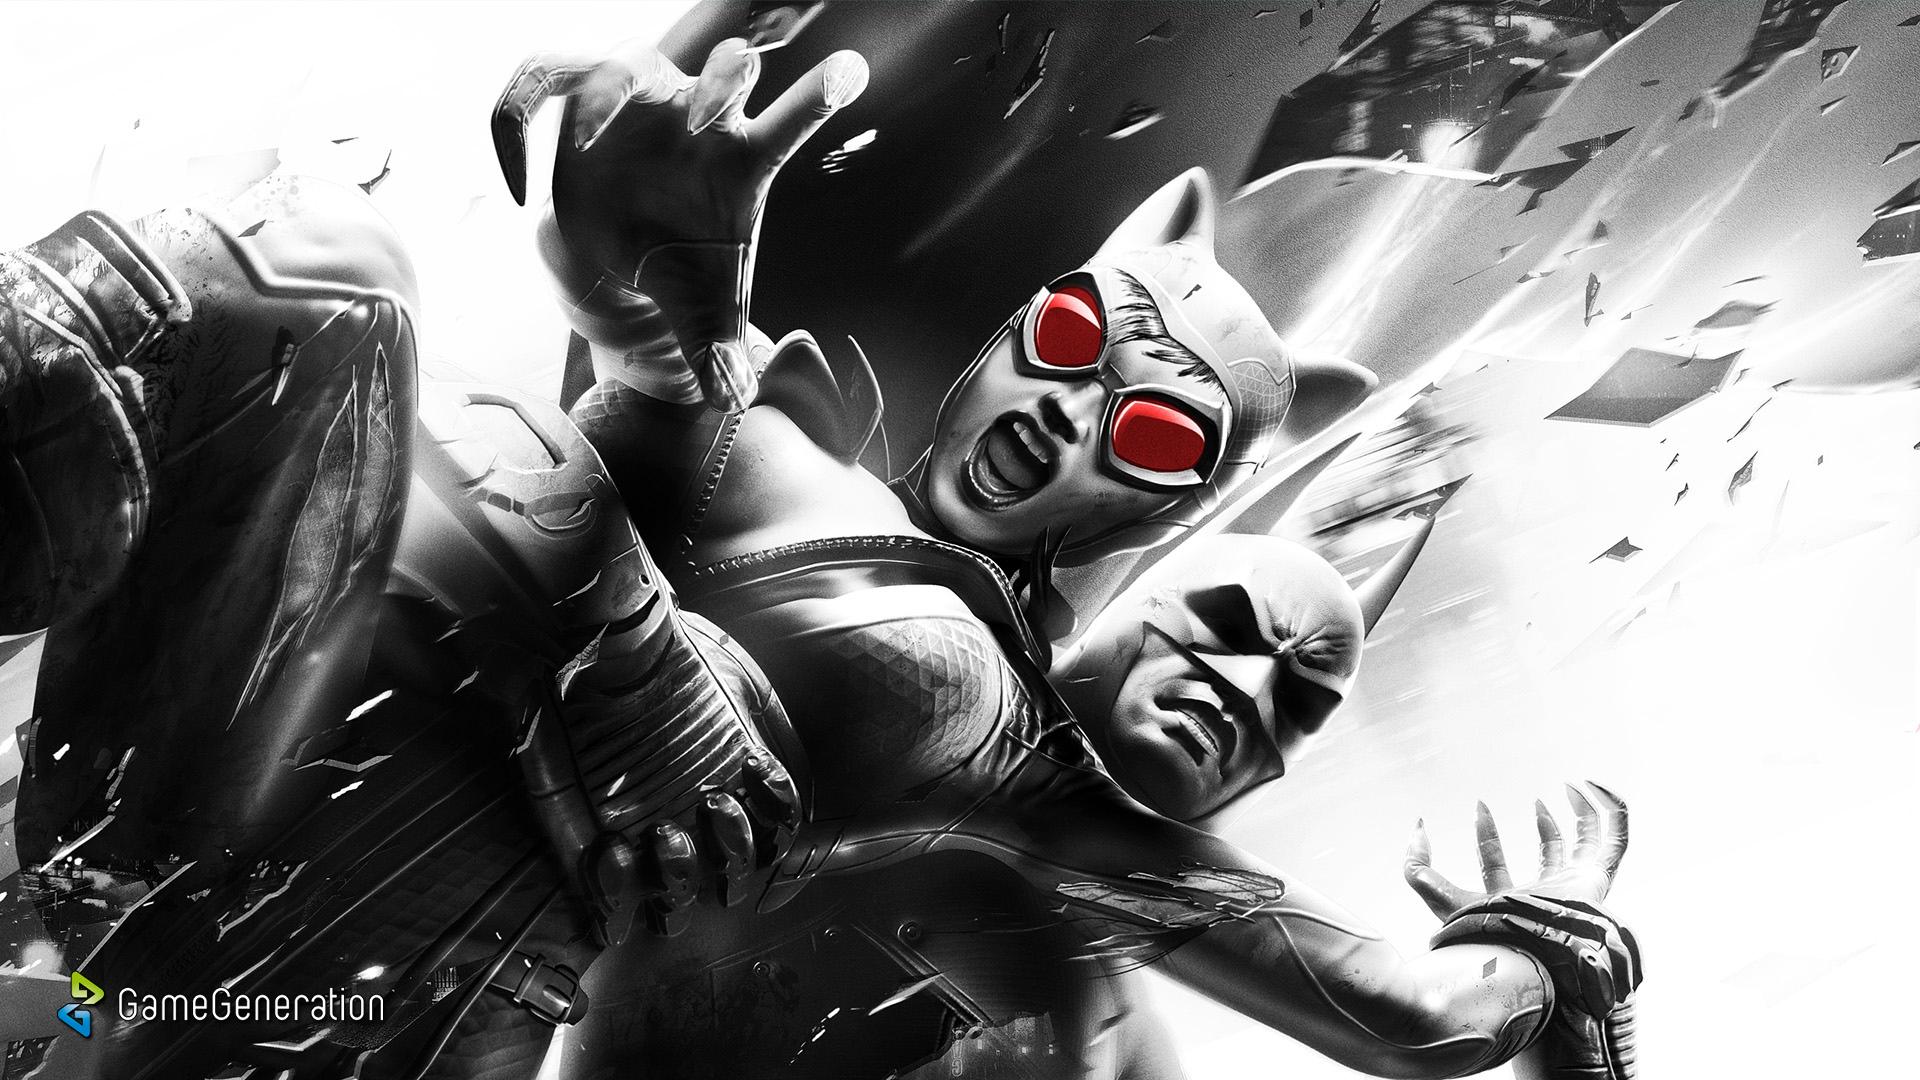 Batman Arkham City Wallpaper 1080p 15367 Hd Wallpapers Background 1920x1080